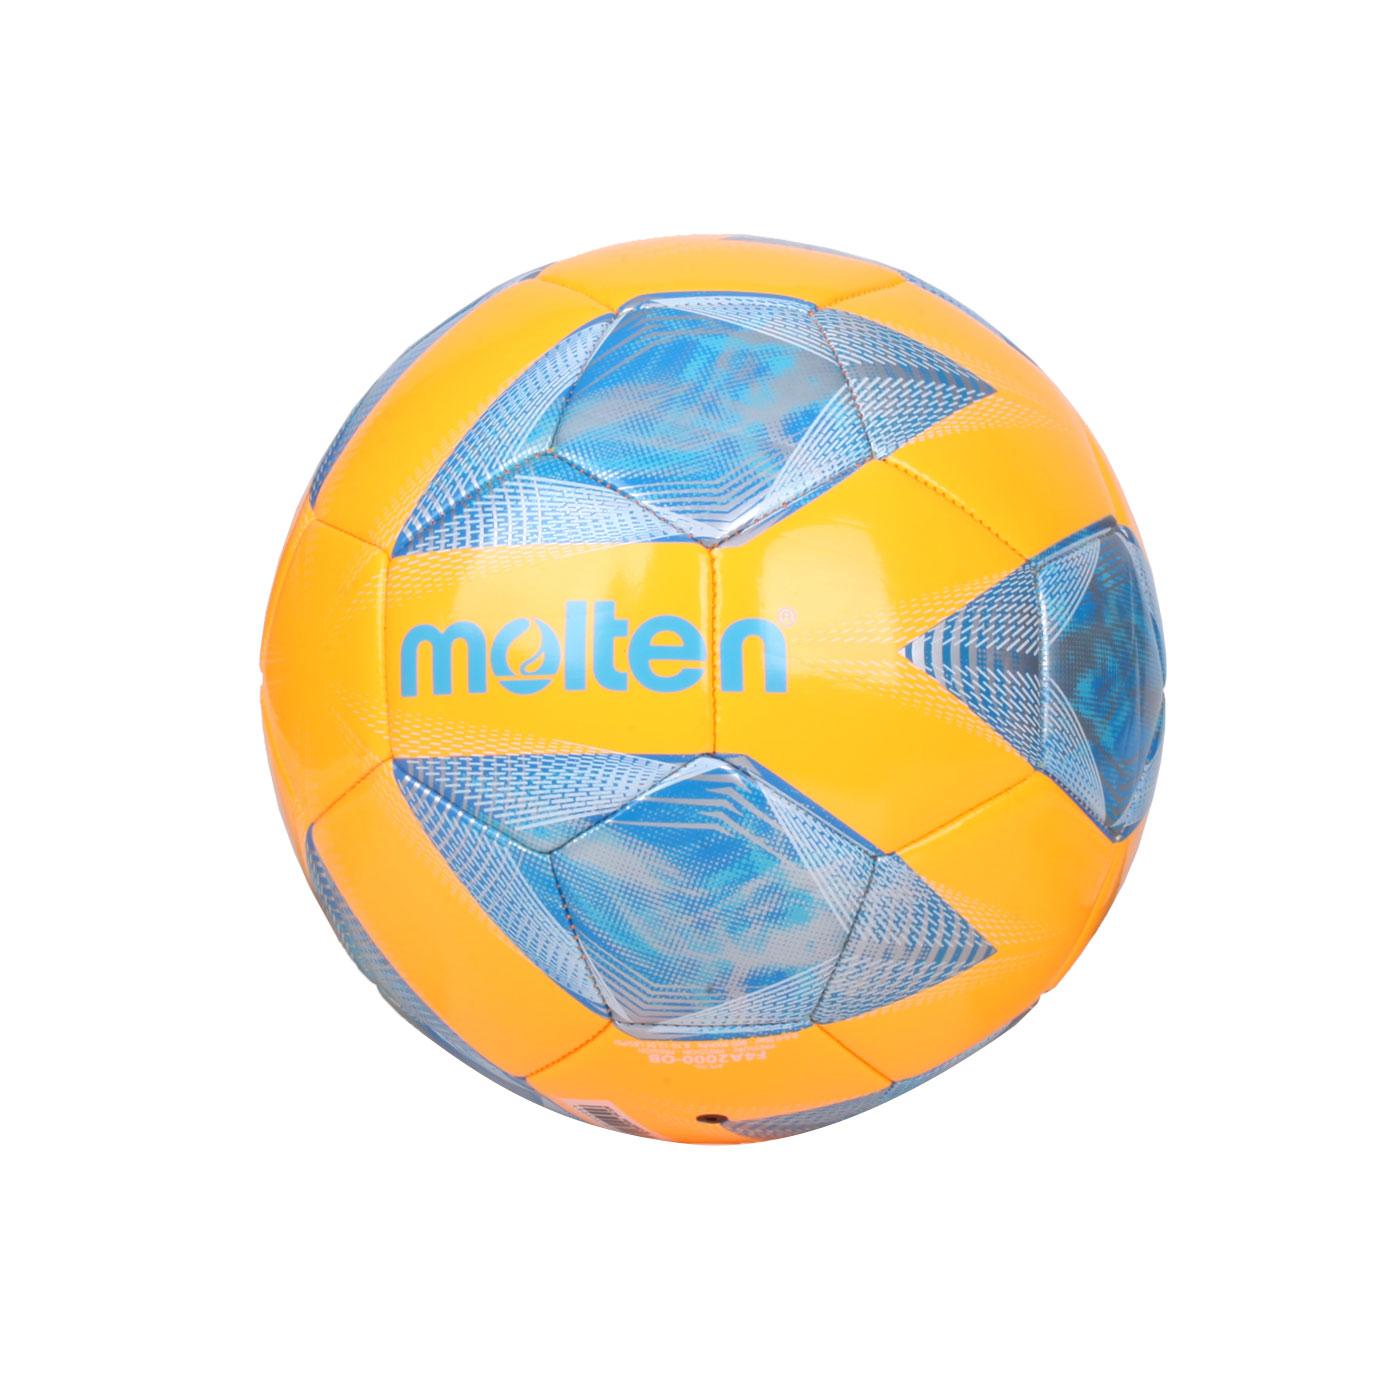 Molten #4合成皮足球 F4A2000 - 橘藍銀